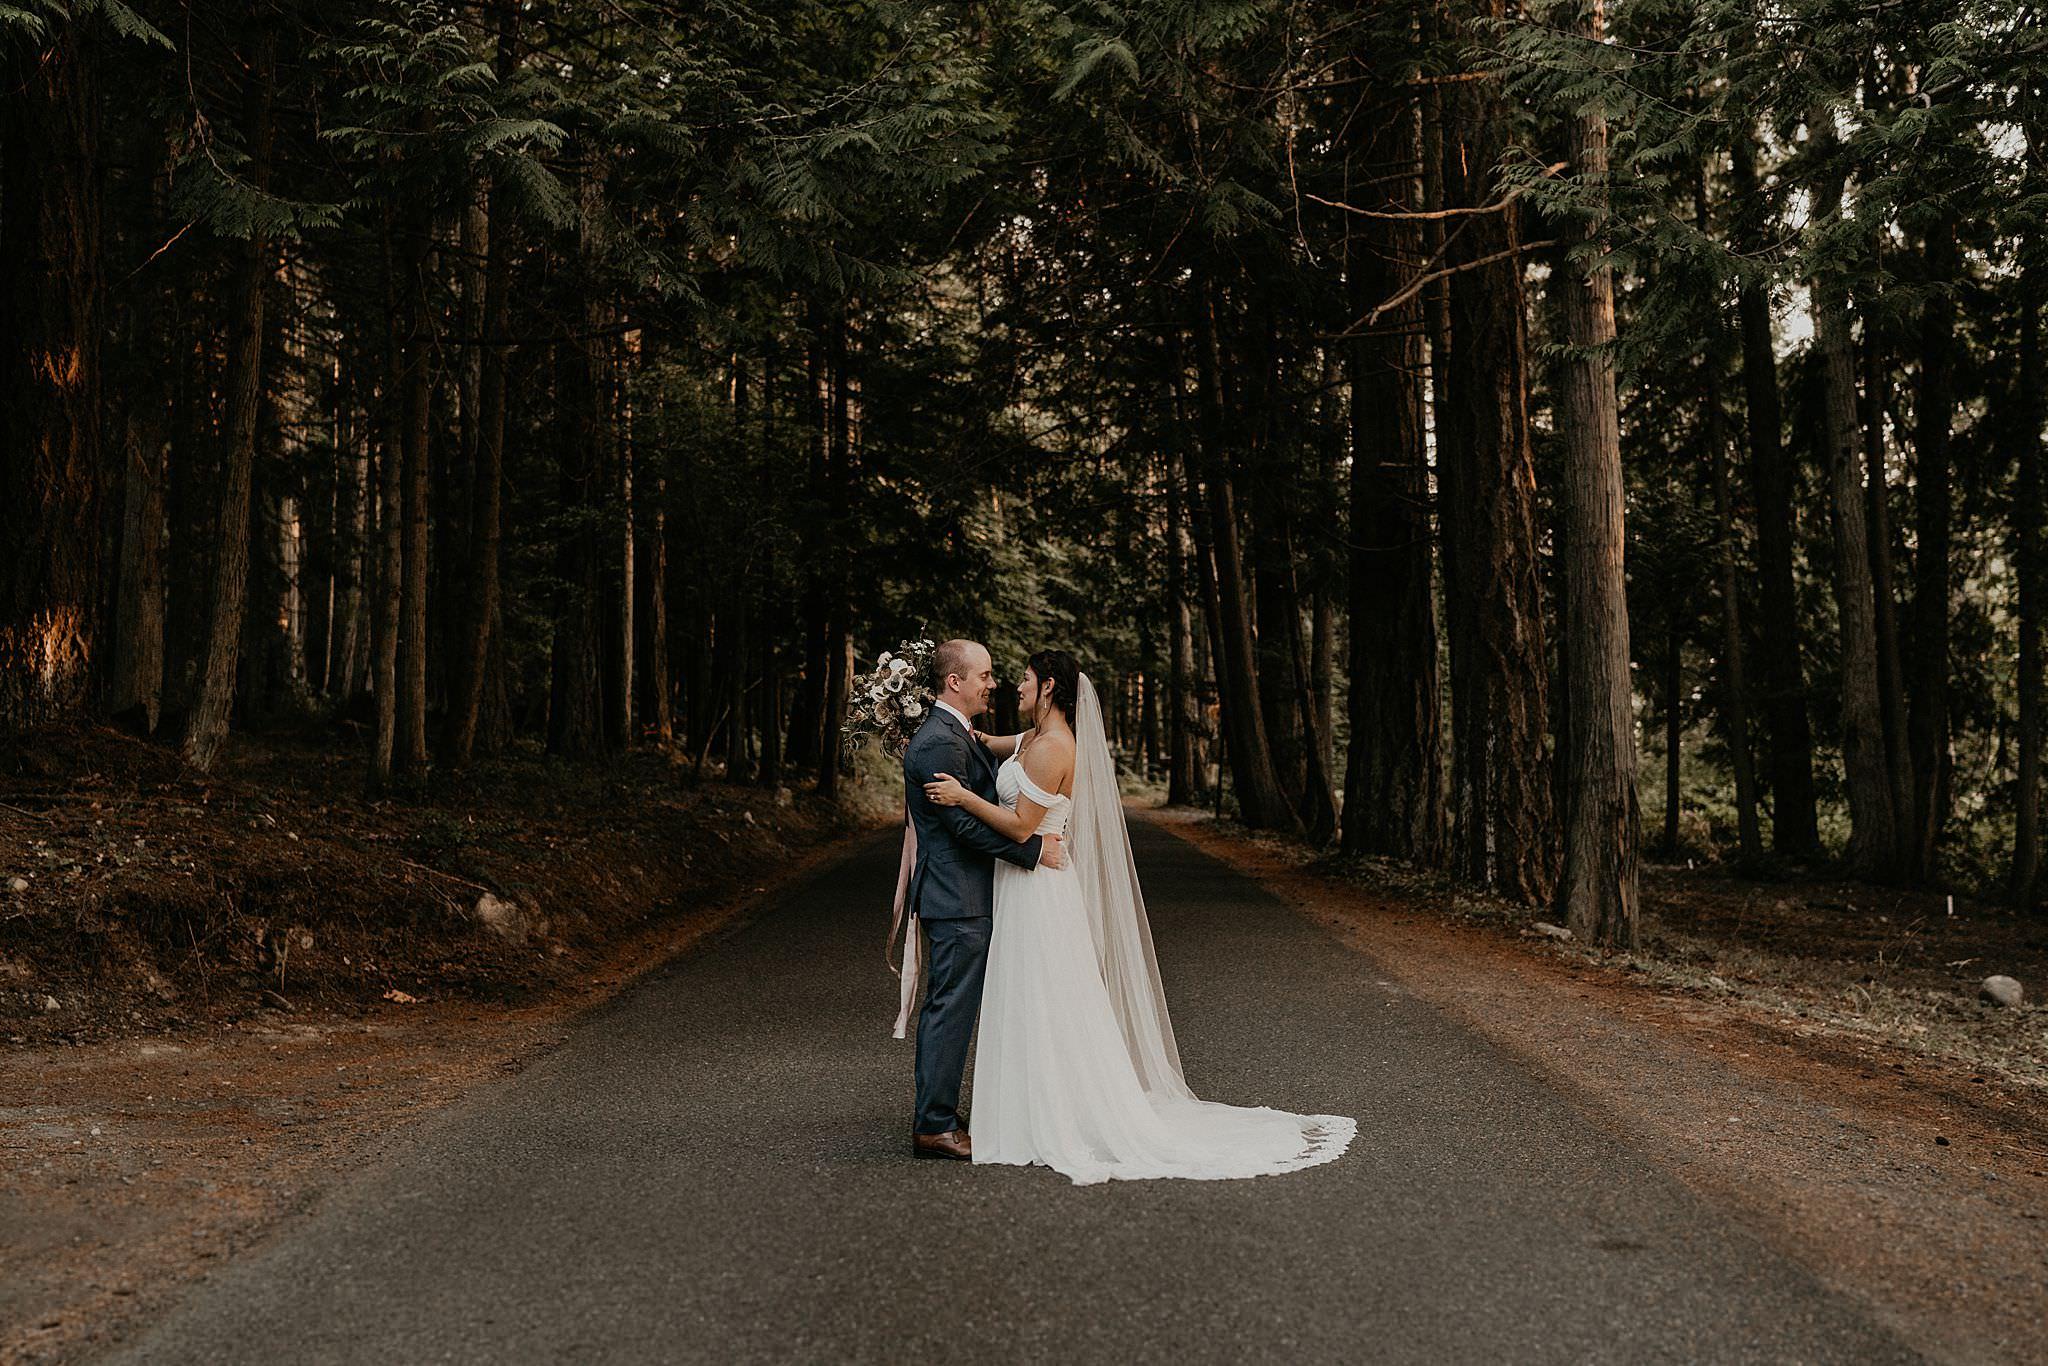 woodsy wedding and elopement Pacific Northwest on San Juan islands